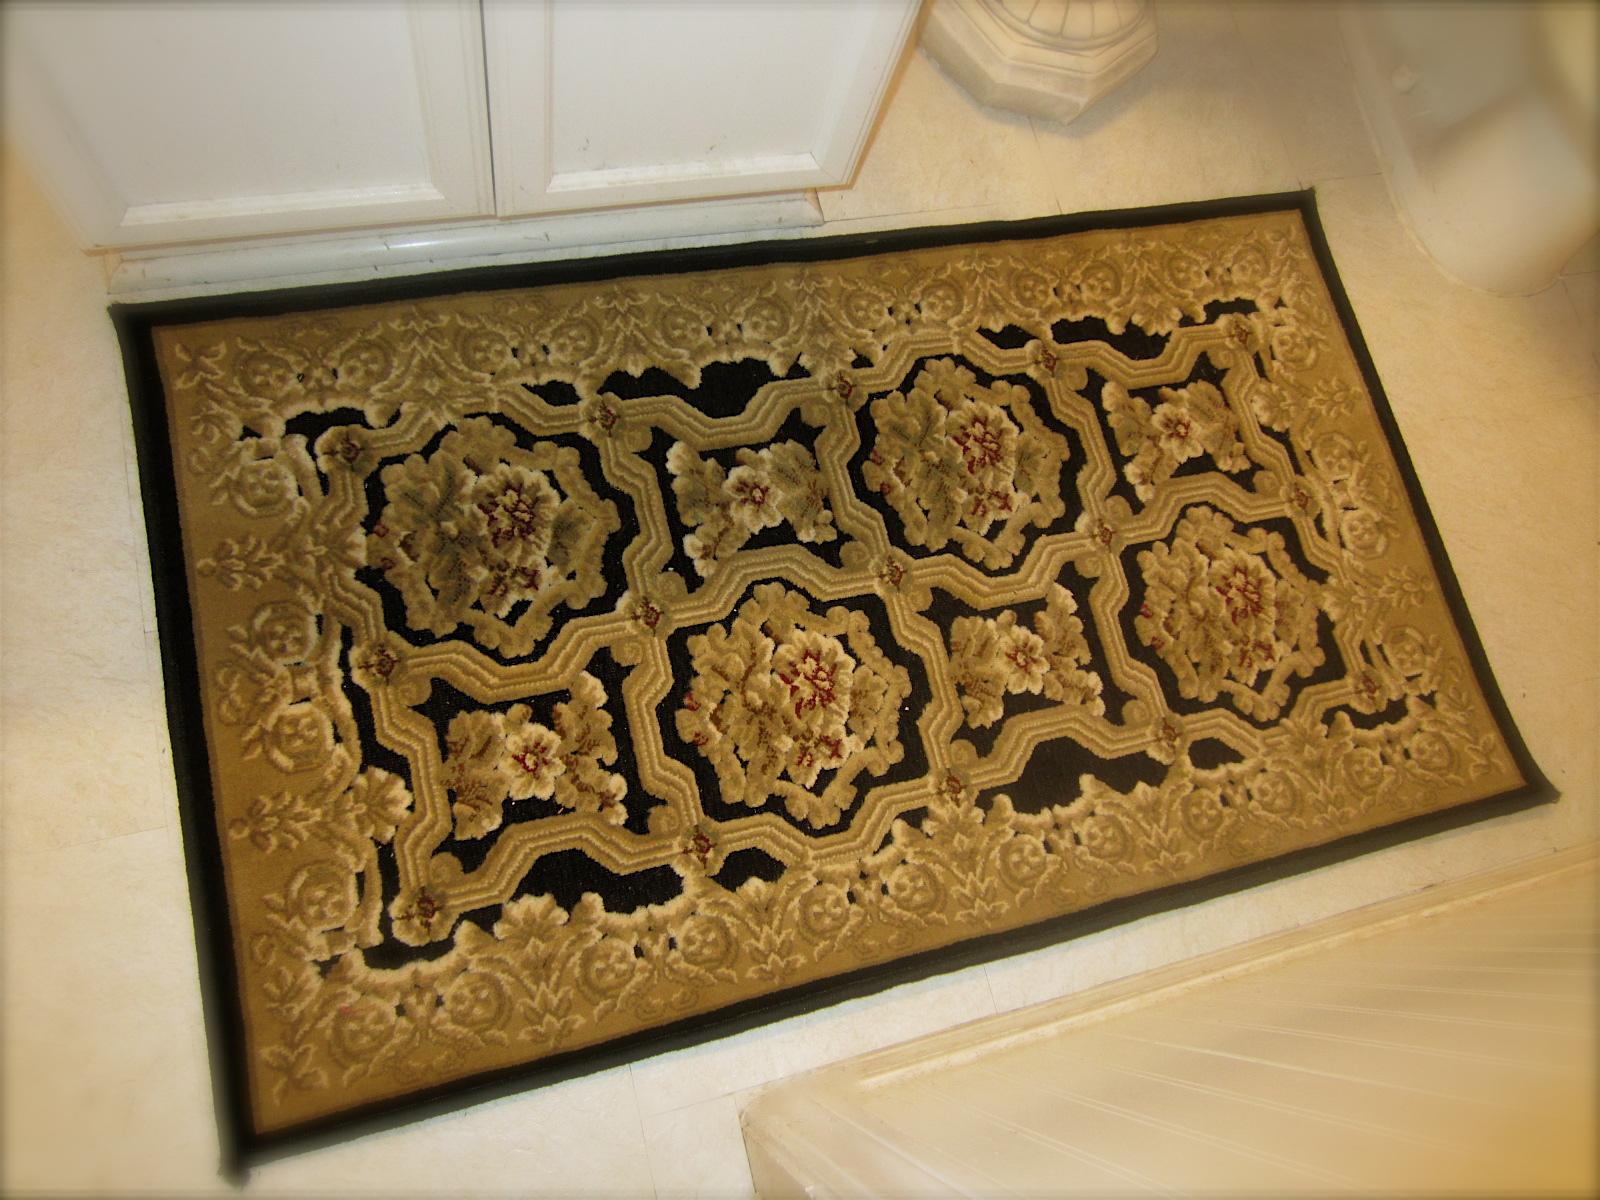 Gold Bathroom Mats